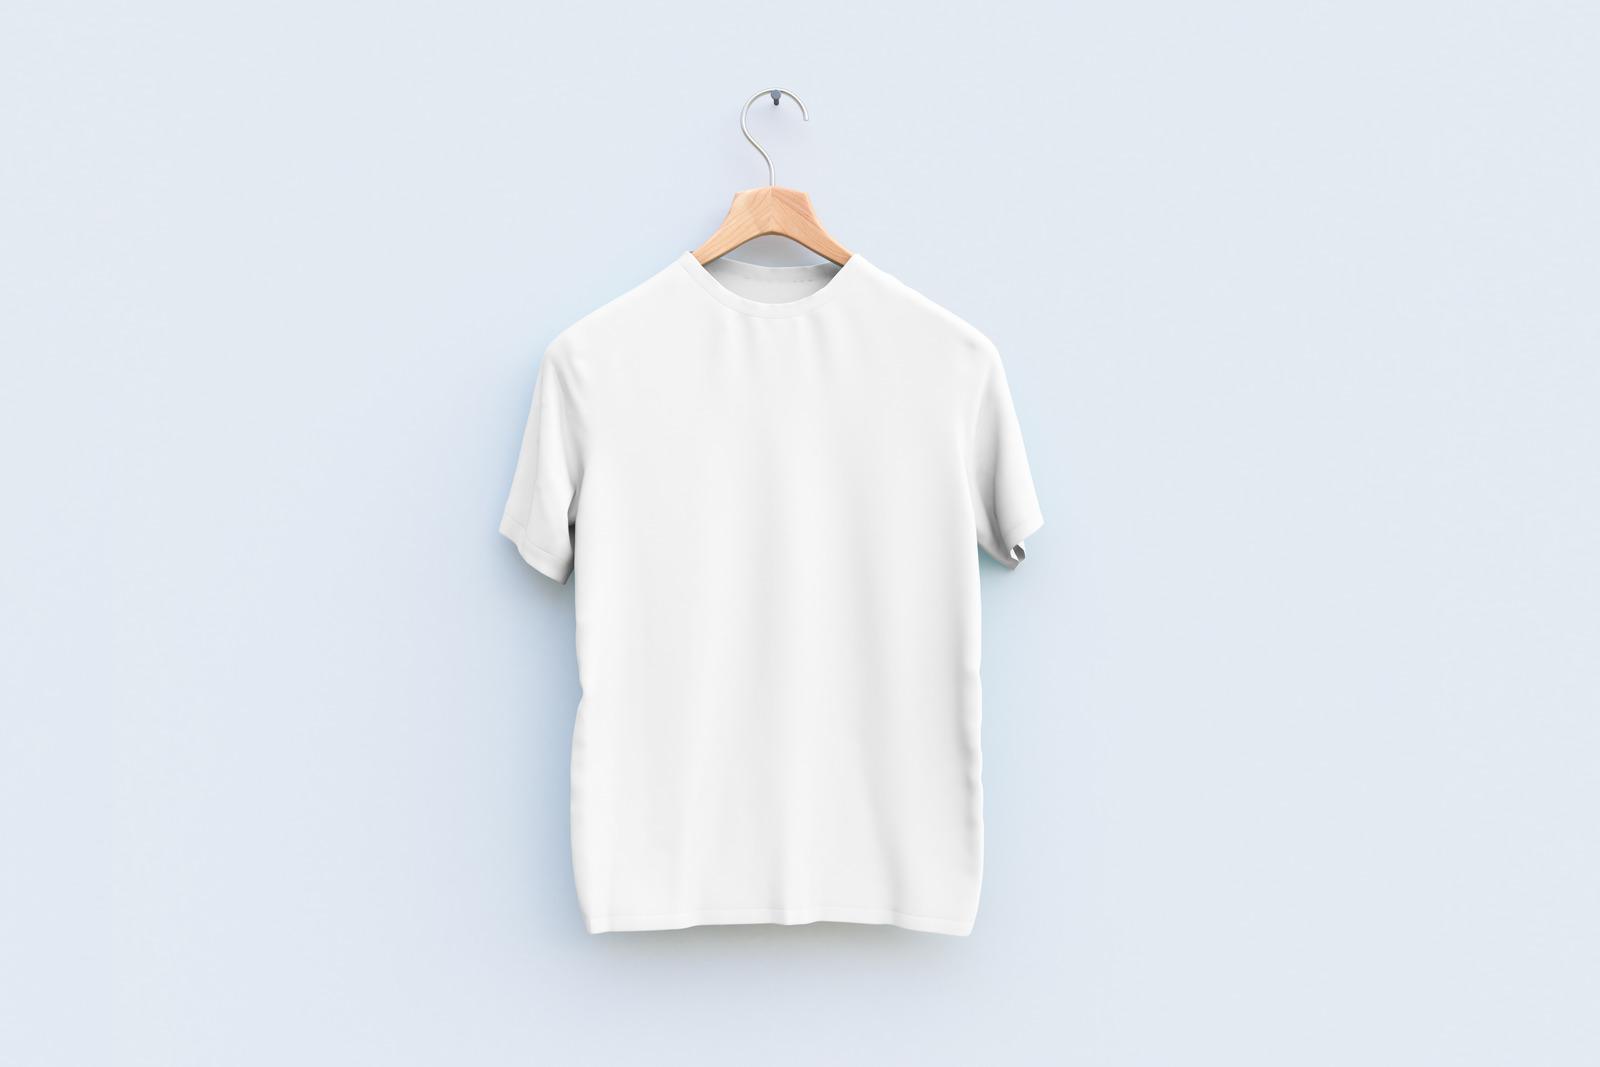 Aladdin Print, Print, Printing, Marketing, Coaster, Mask, T Shirt, Sticker, Branding, Logo